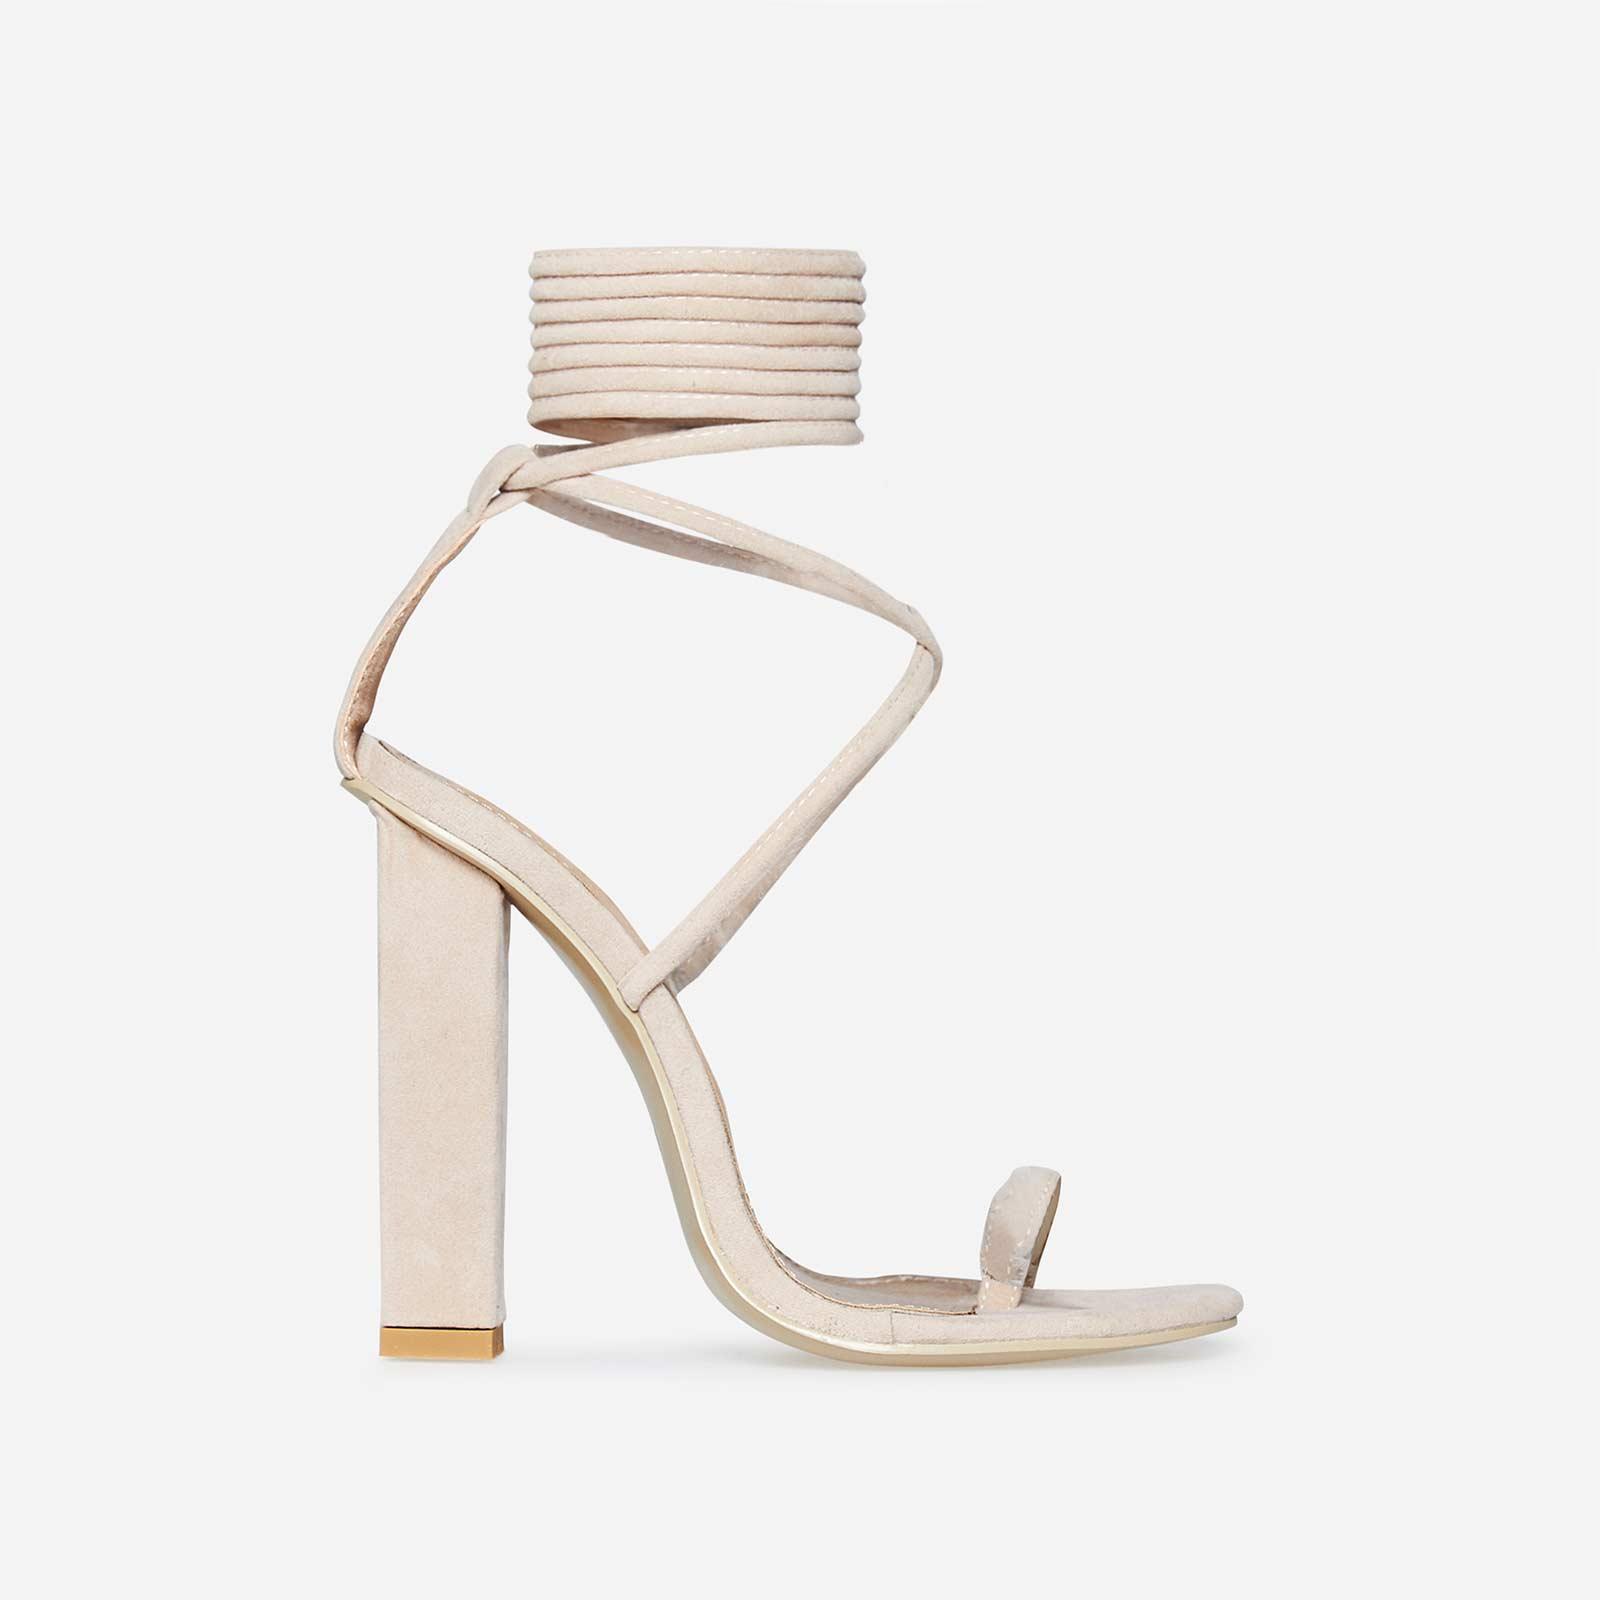 82fbae68ddb Lace-up High Heels - Knee High Tie Up   Black Styles